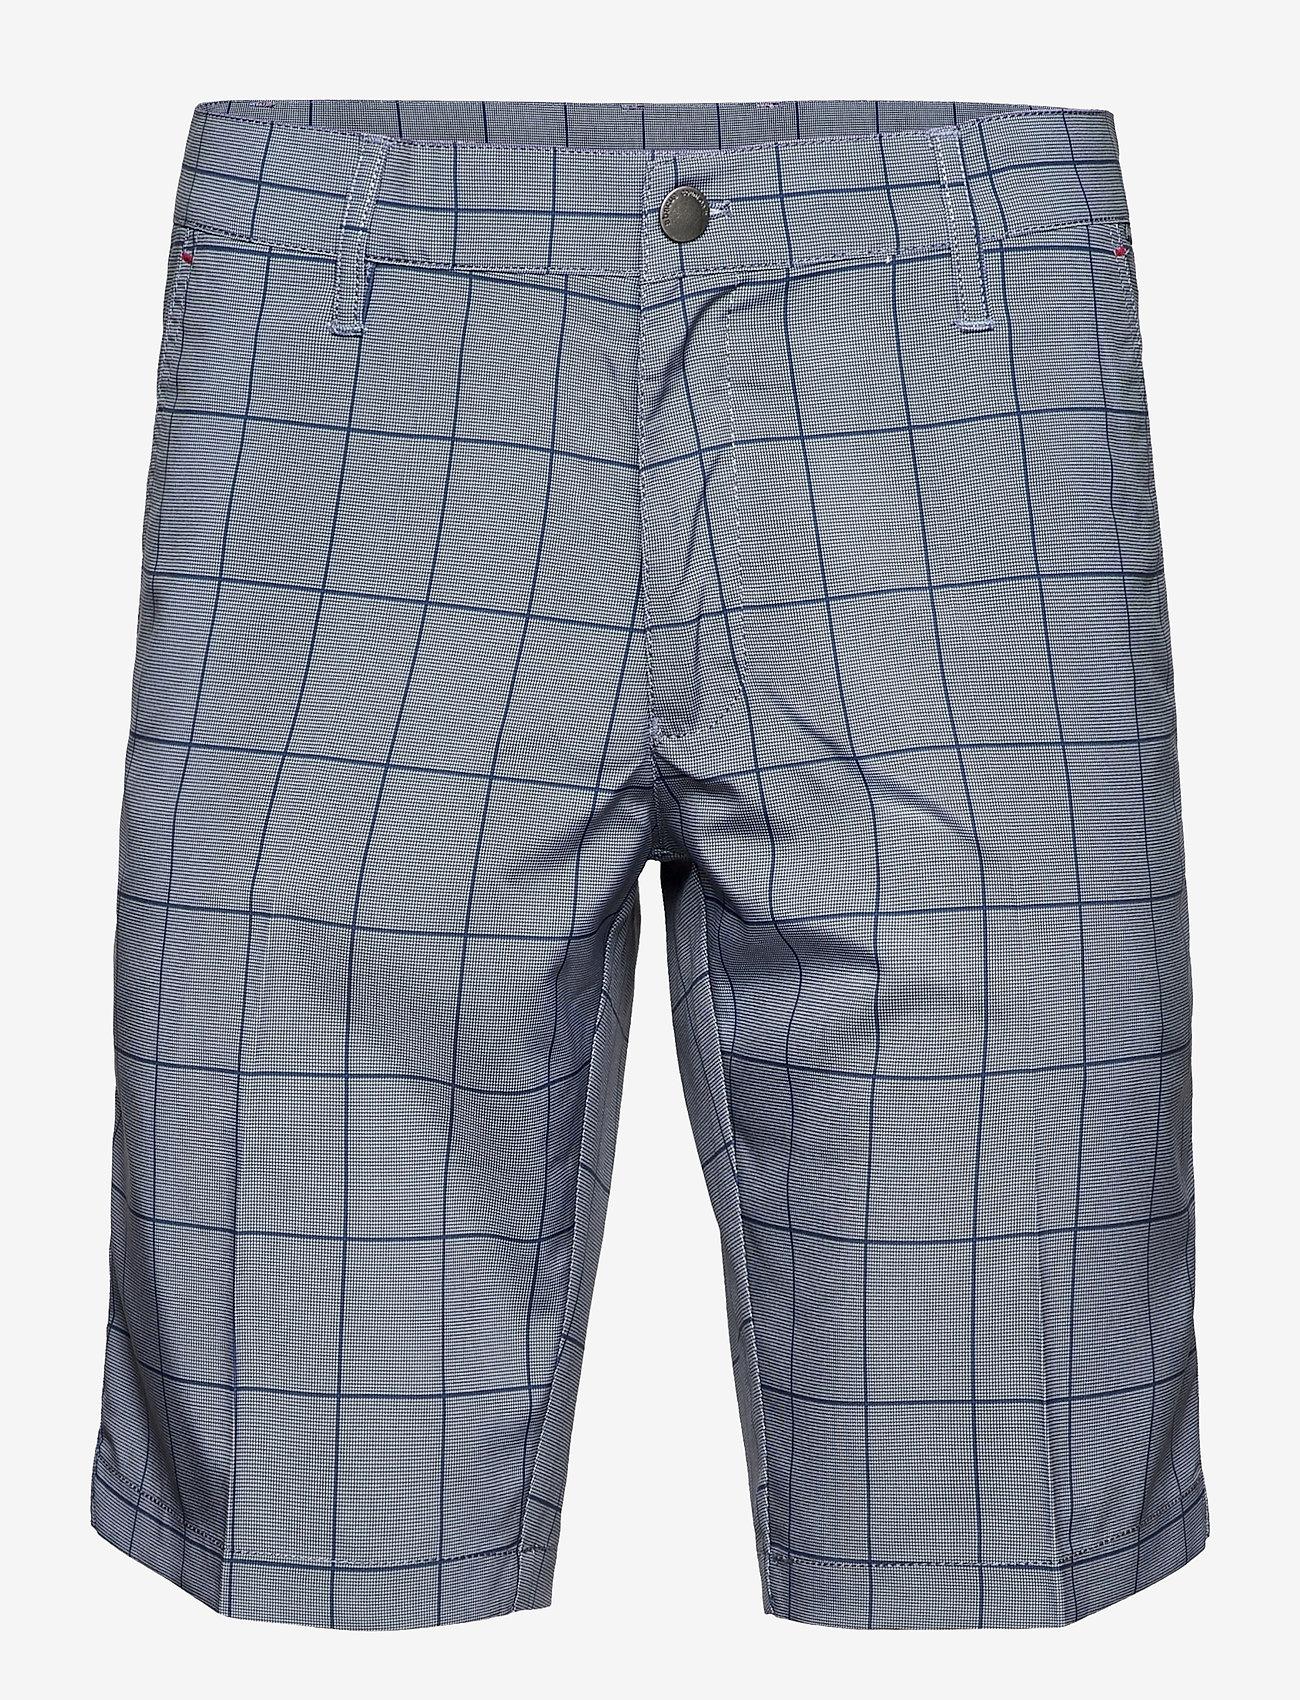 Abacus - Yas shorts - short de golf - navy check - 0